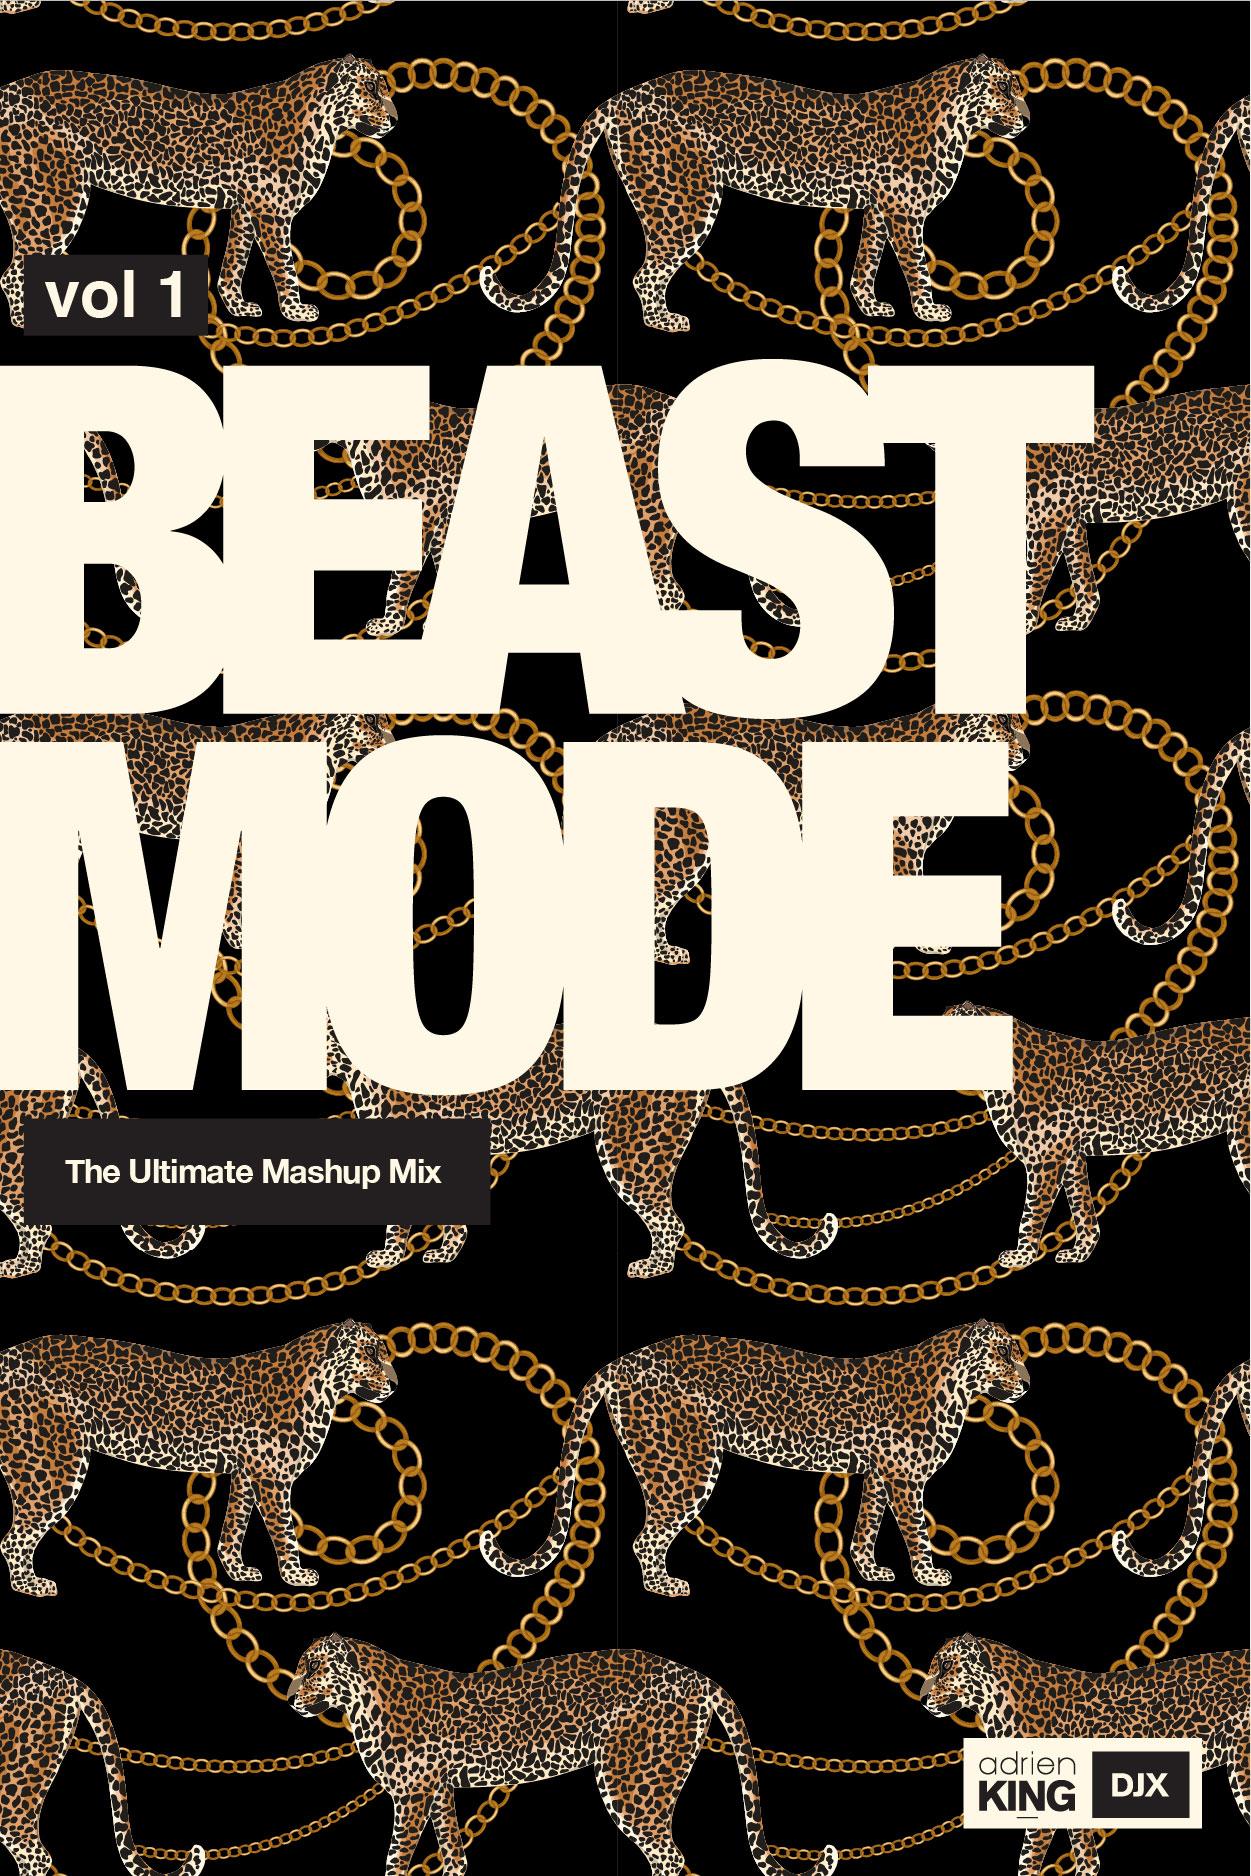 Beast Mode - The Ultimate Mashup Mix - Adrien DJX King Vol 1